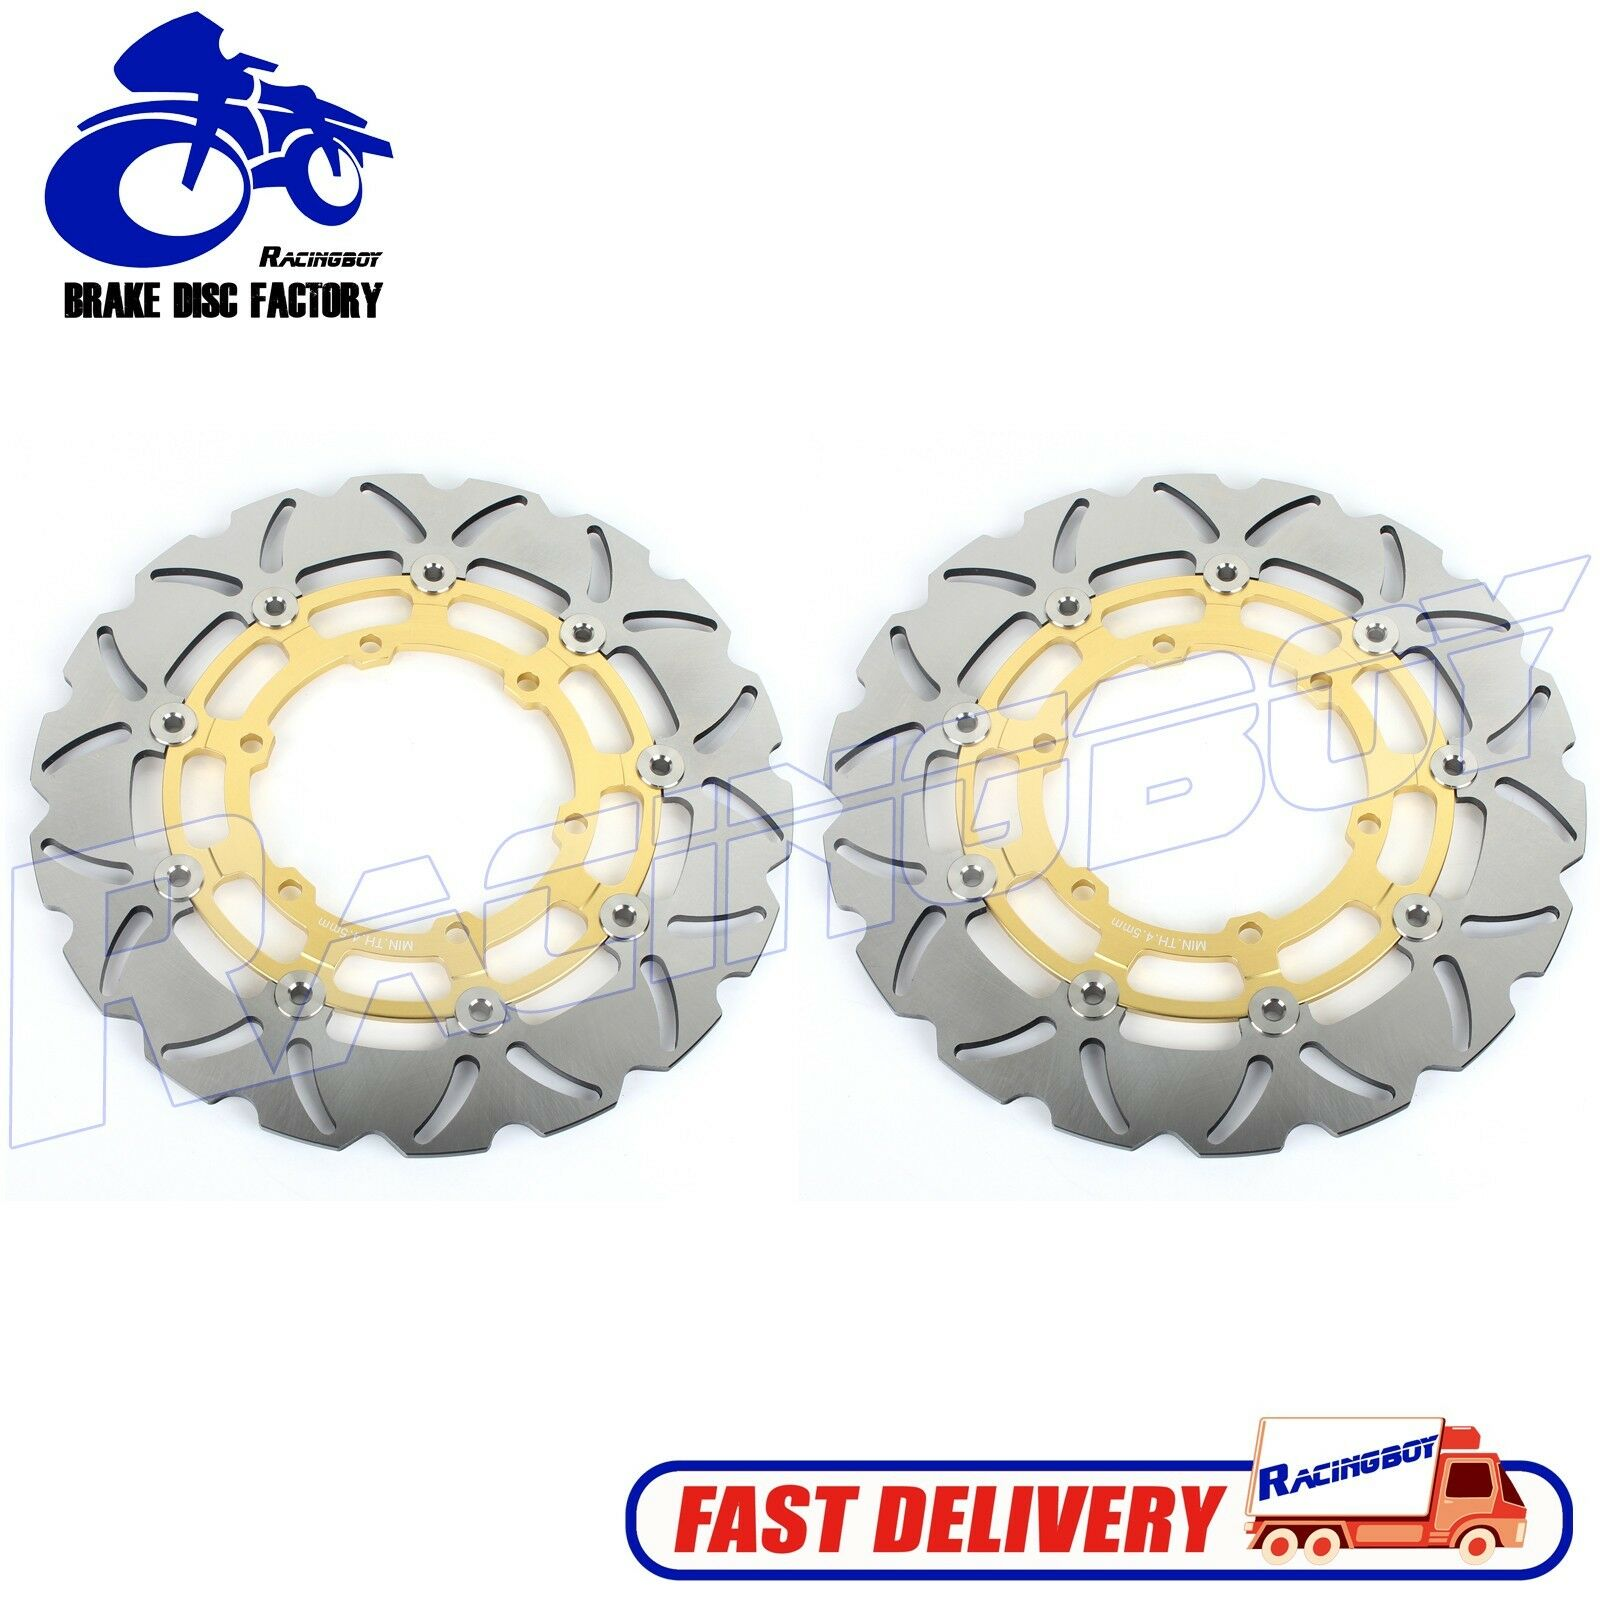 Carbon Brushes Makita 5X11X17 2107 4100 4101 4131 4200 5044 5604 5703 5704  MK2